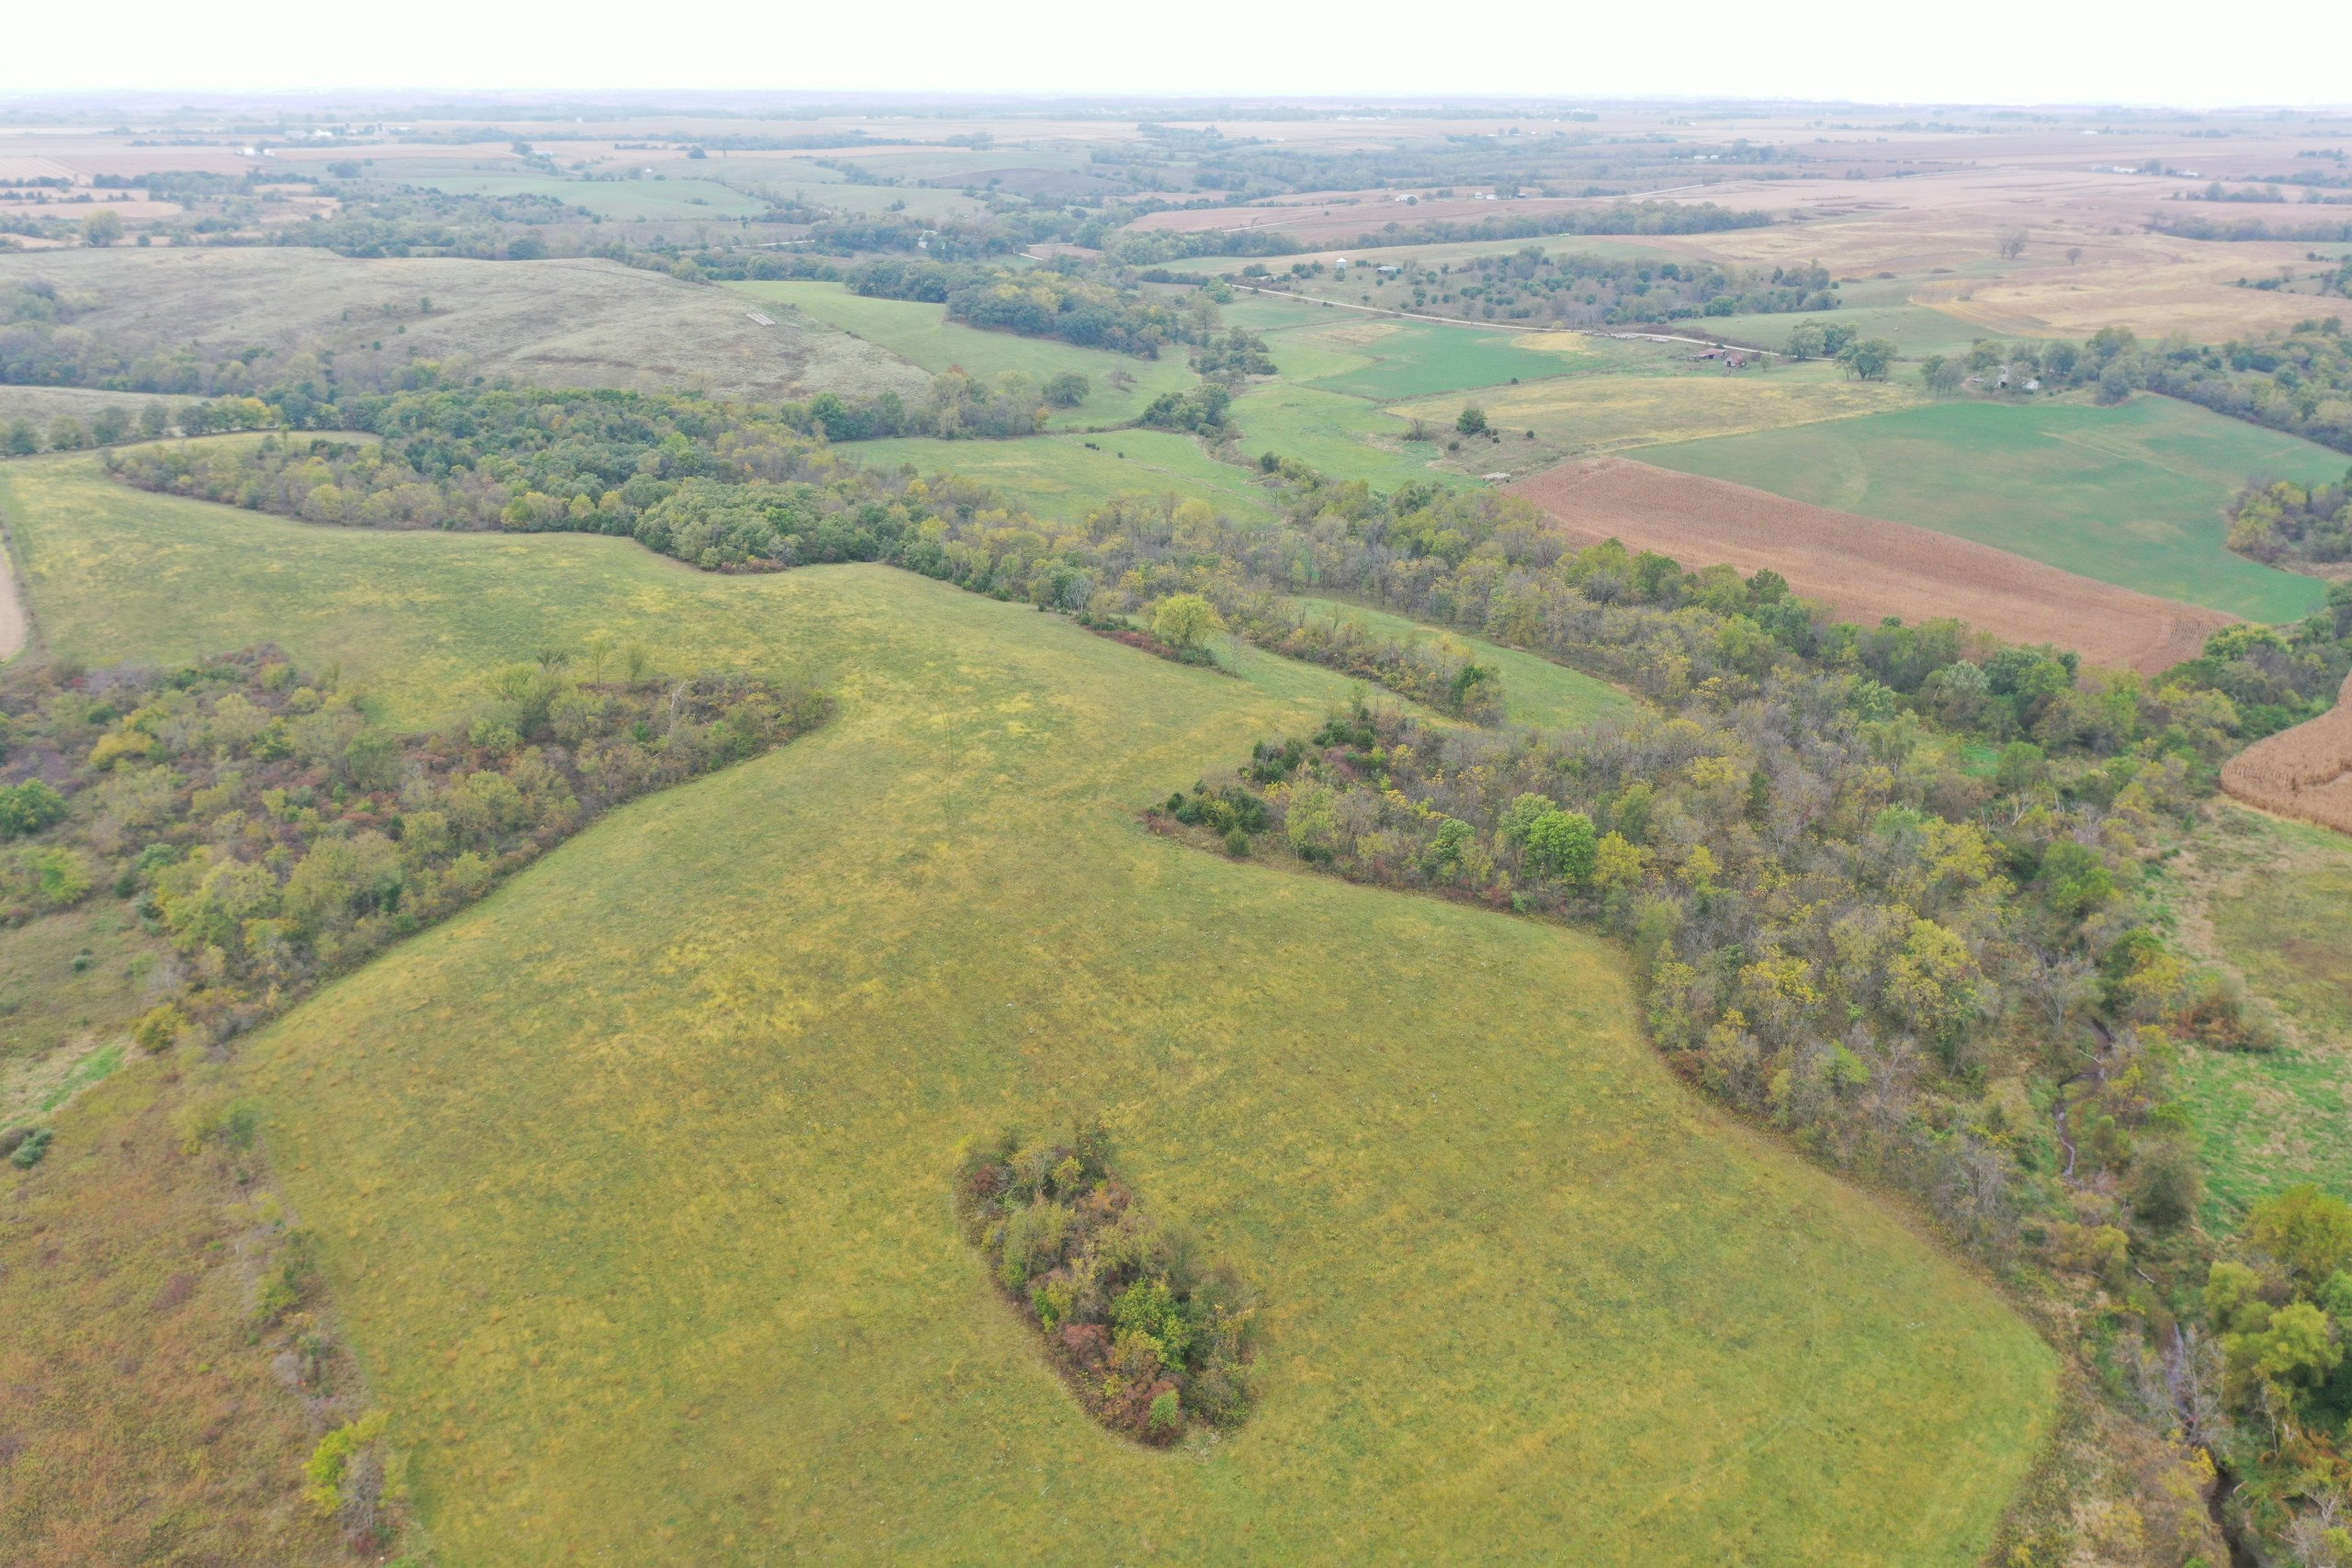 land-warren-county-iowa-200-acres-listing-number-15810-DJI_0589-0.jpg